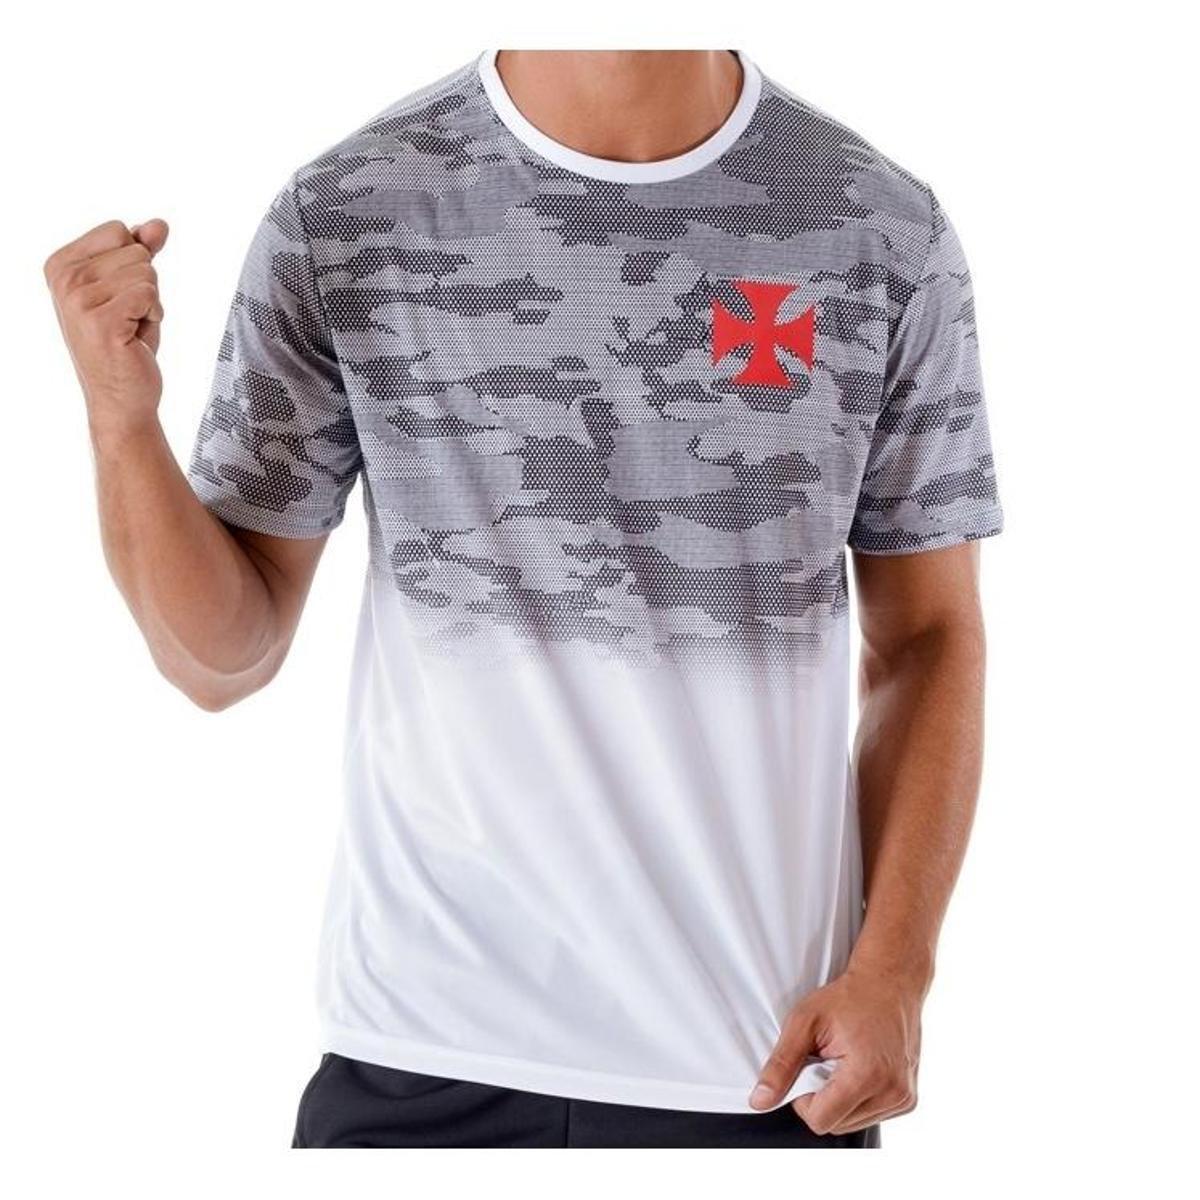 0989eda6c1 Camiseta Vasco Camo Masculina - Branco - Compre Agora